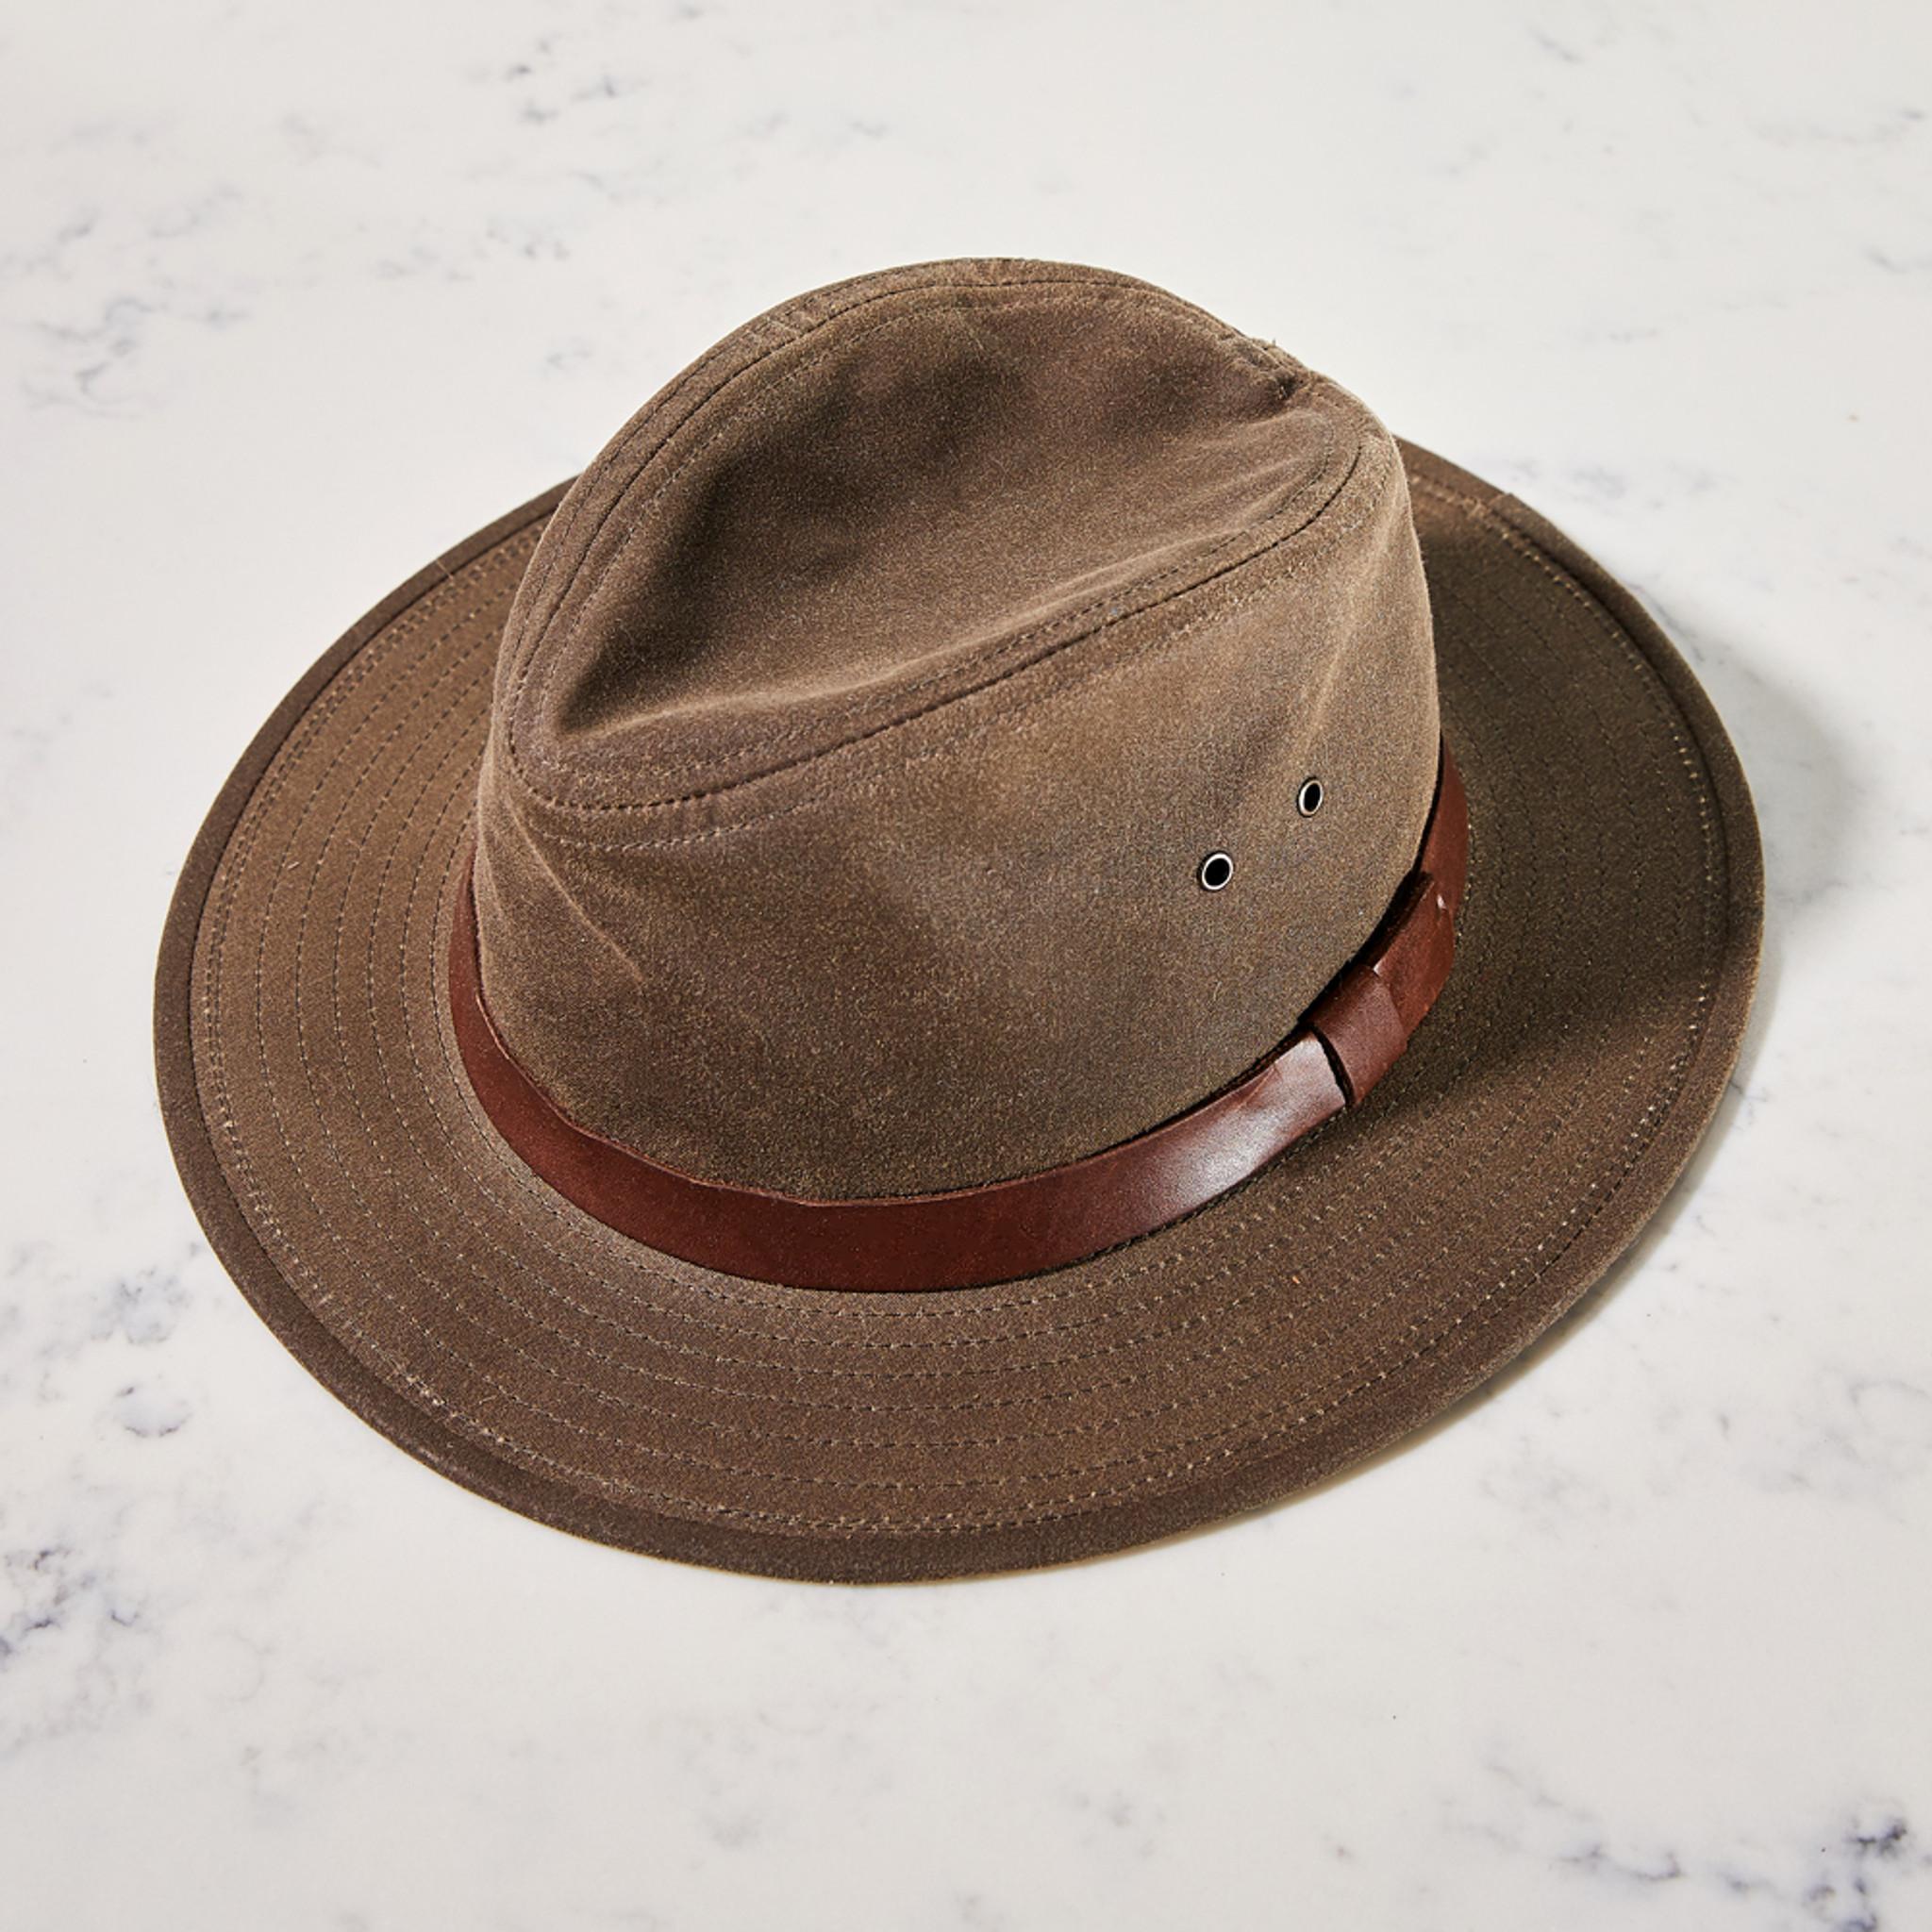 22ff2578288bcb Field Hat by Tom Beckbe - Fieldshop by Garden & Gun